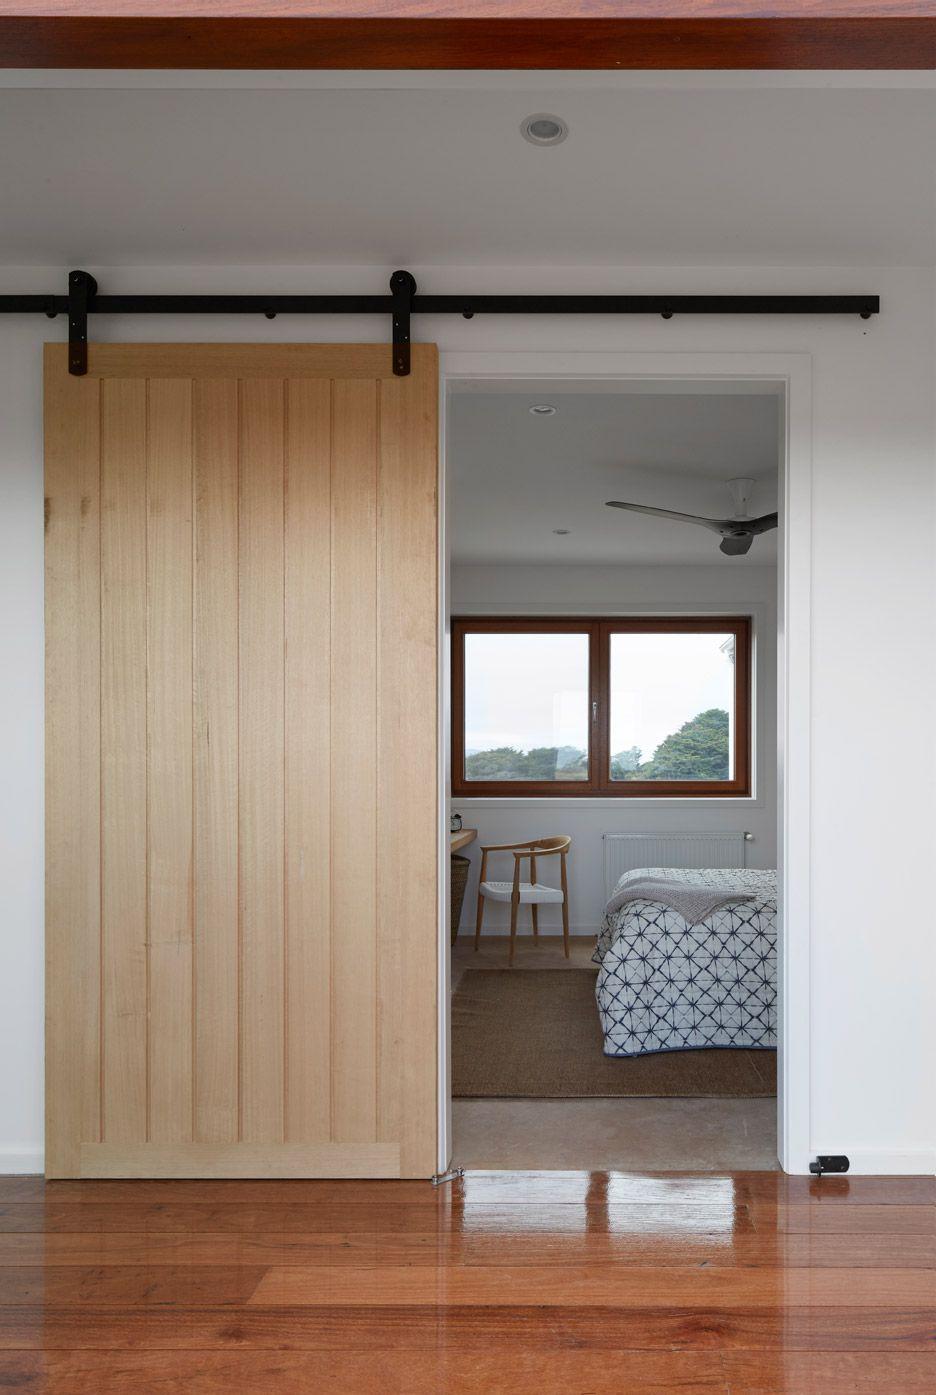 Barn doors | Shed house | Pinterest | Flure und Deko